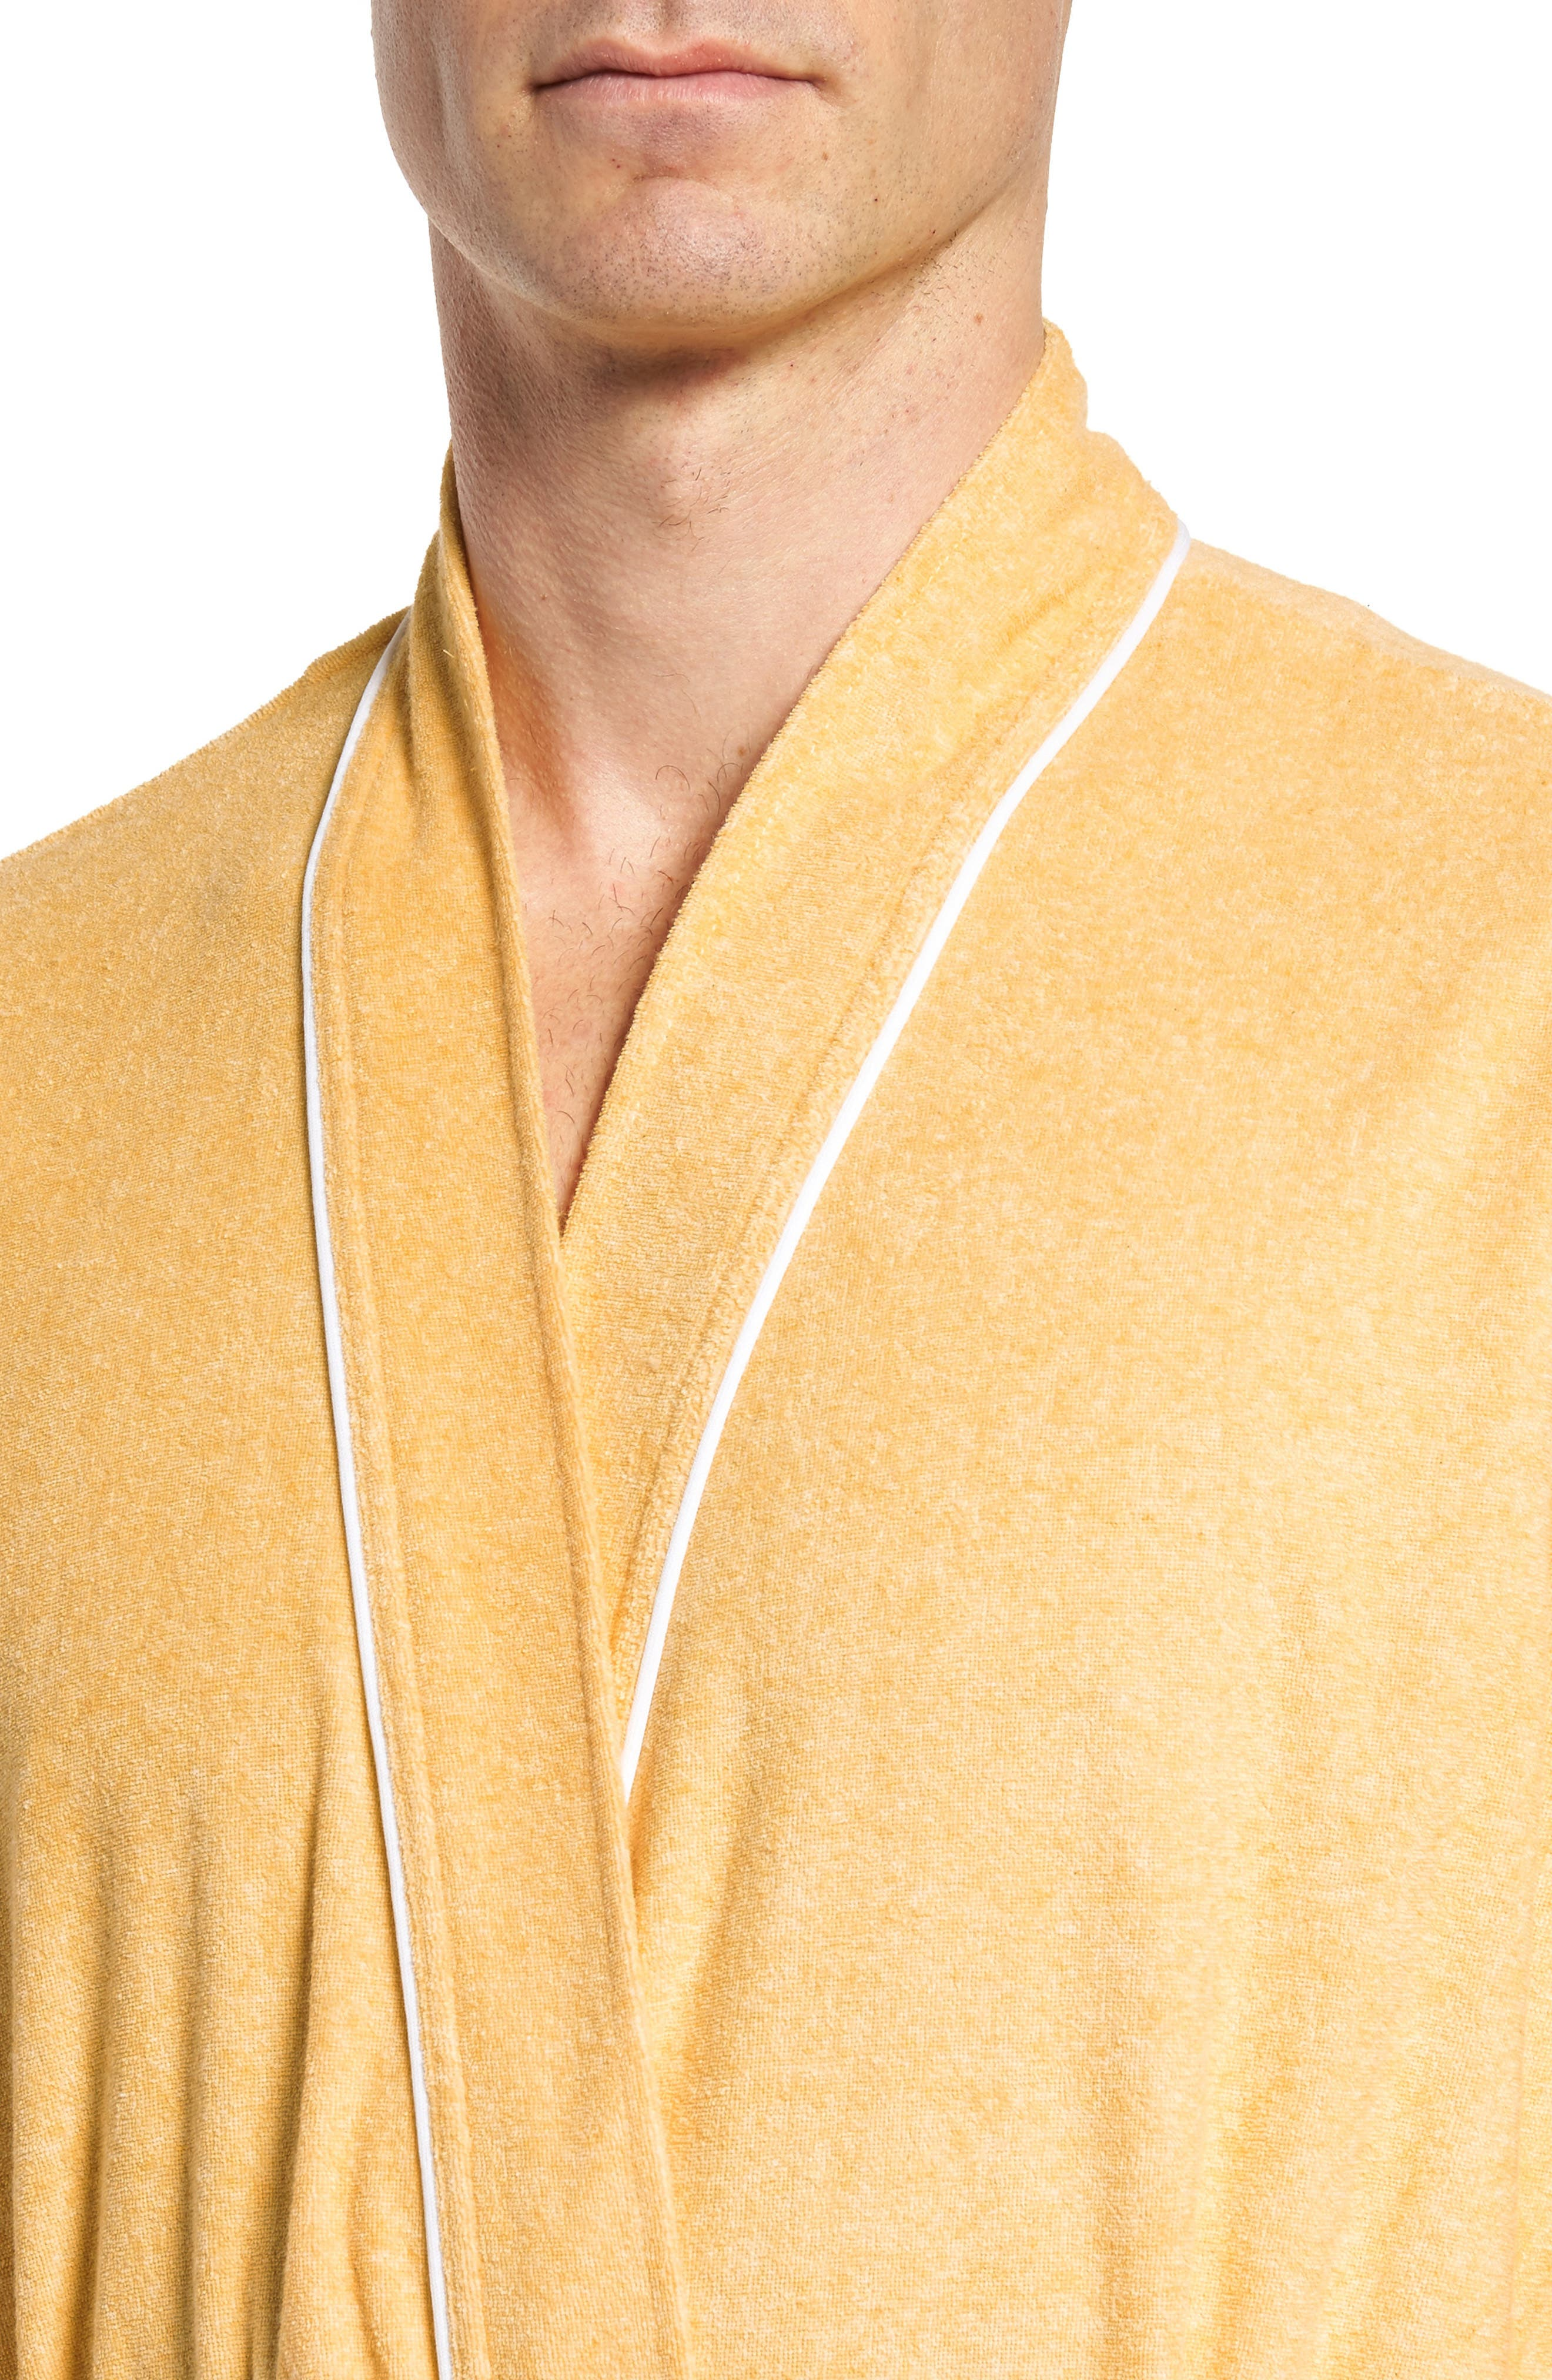 Kimono Cotton Blend Robe,                             Alternate thumbnail 4, color,                             700